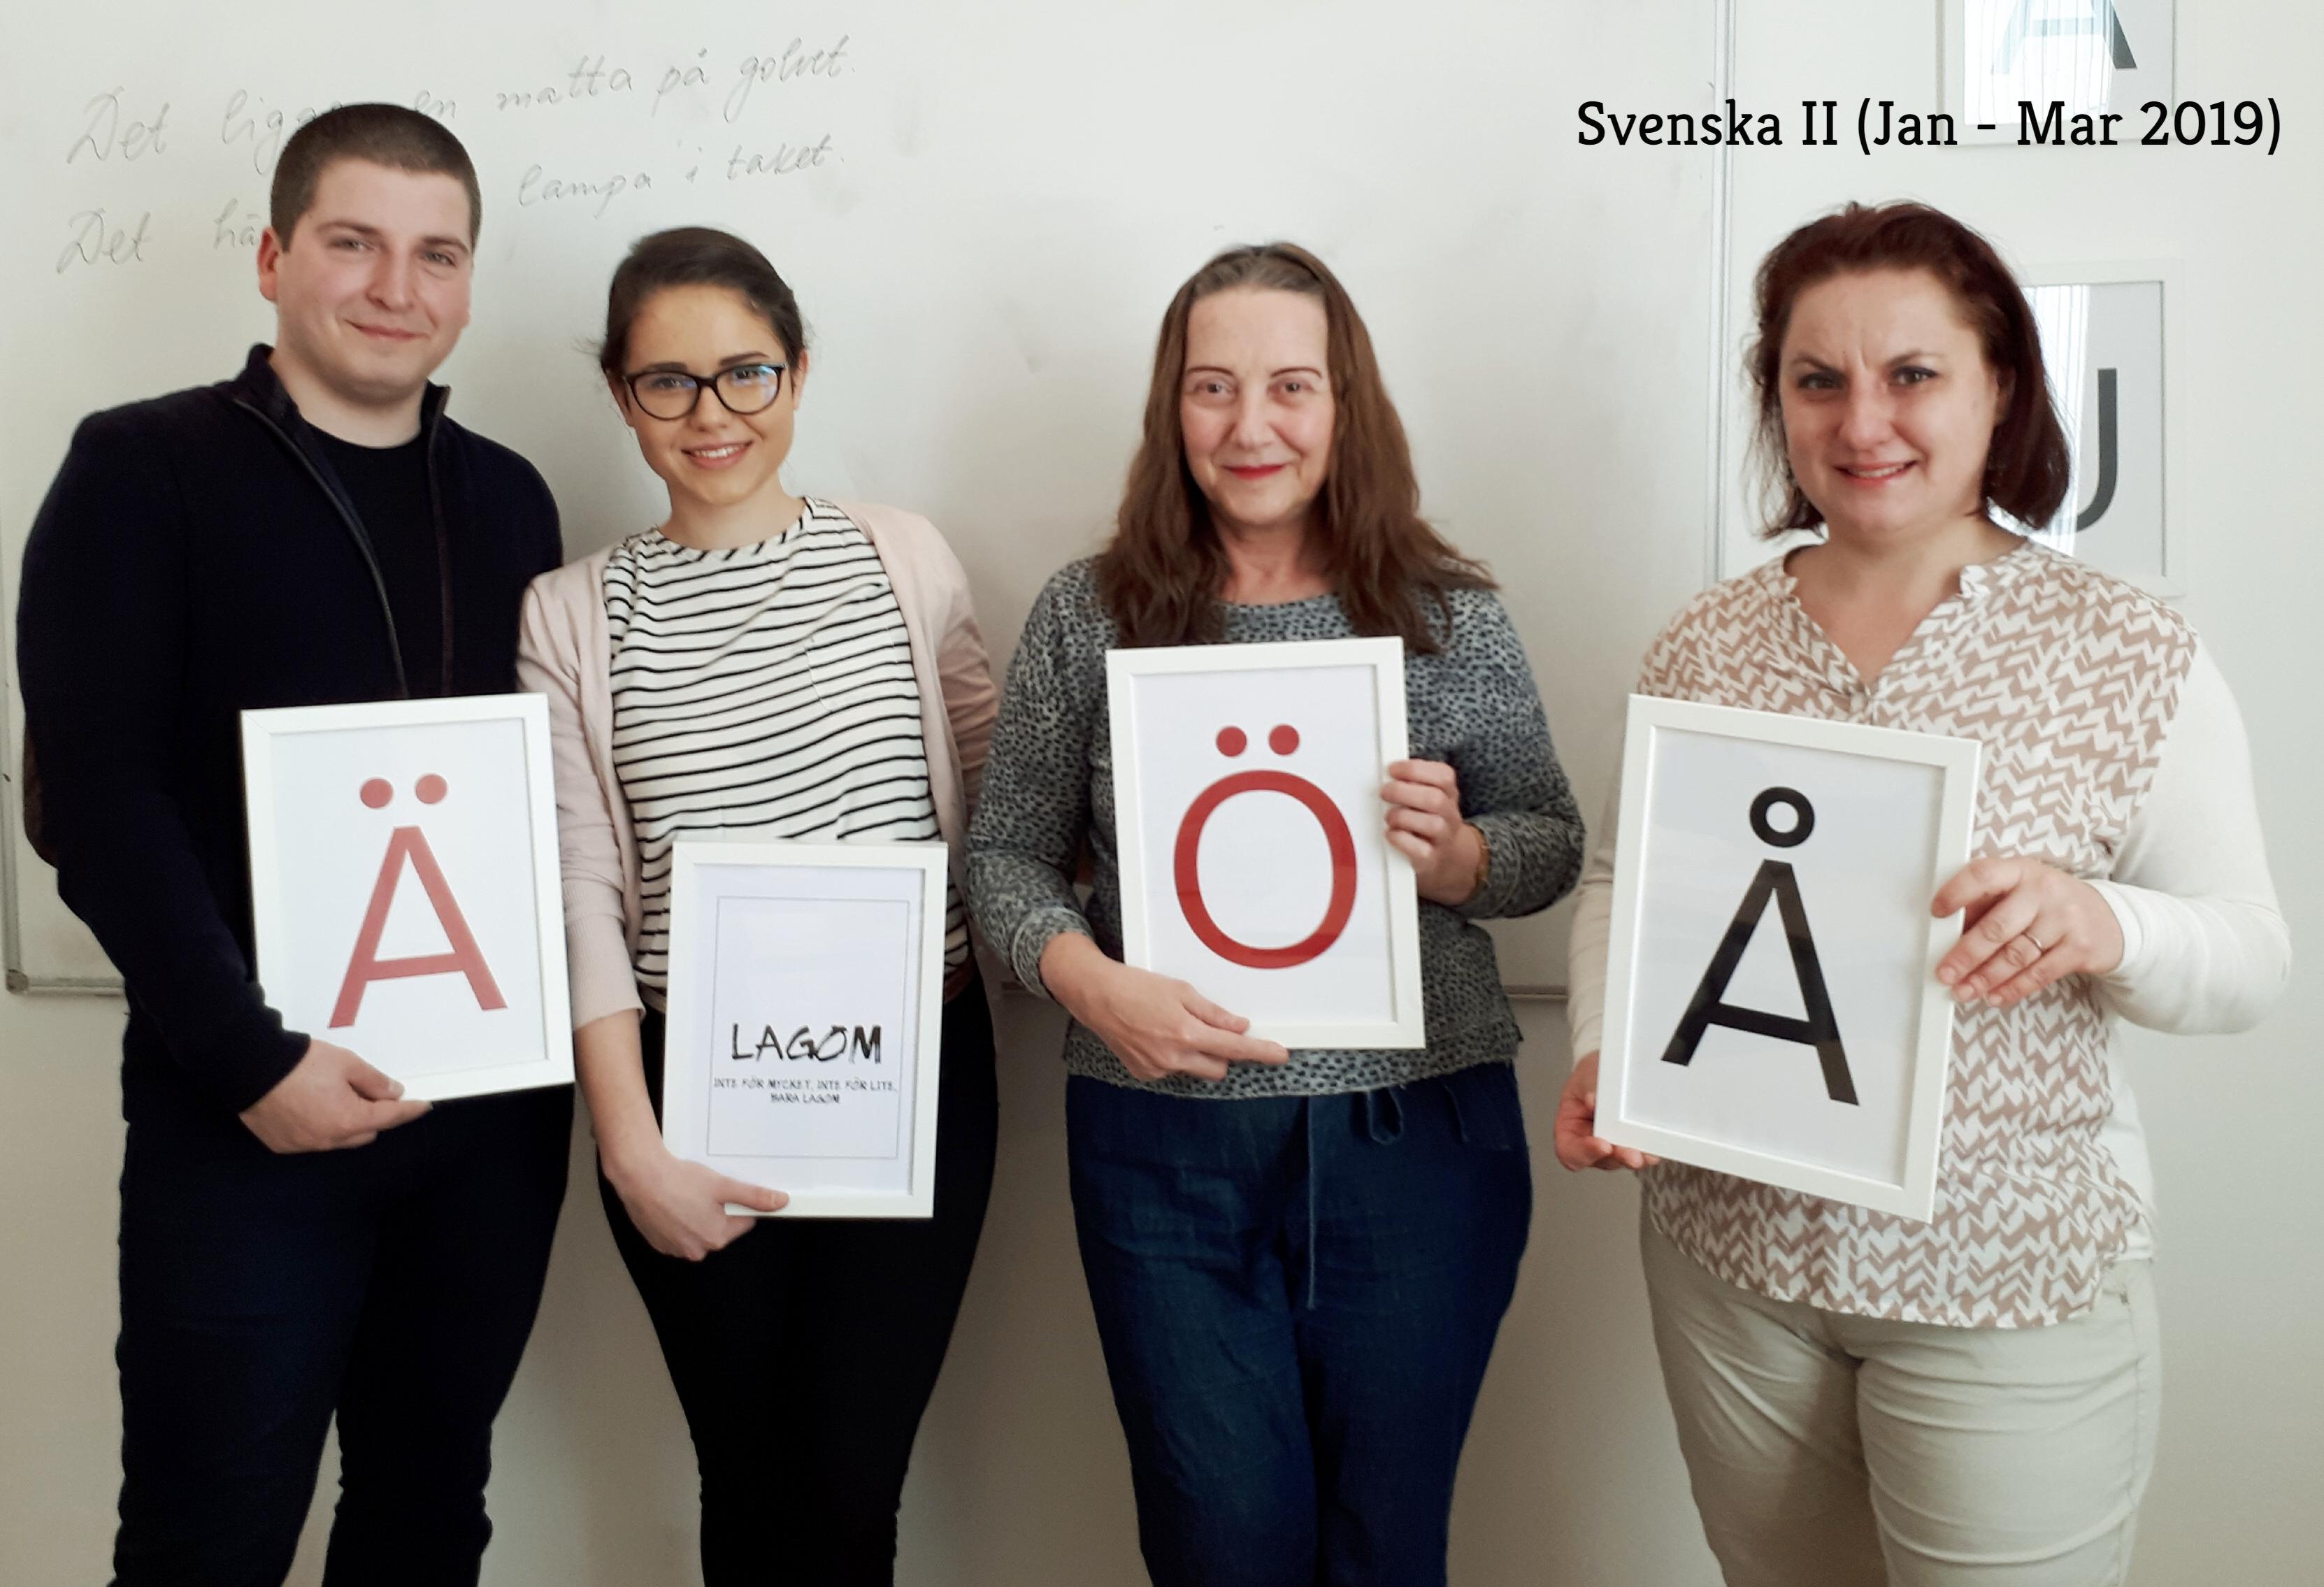 Svenska II 01-03.2019